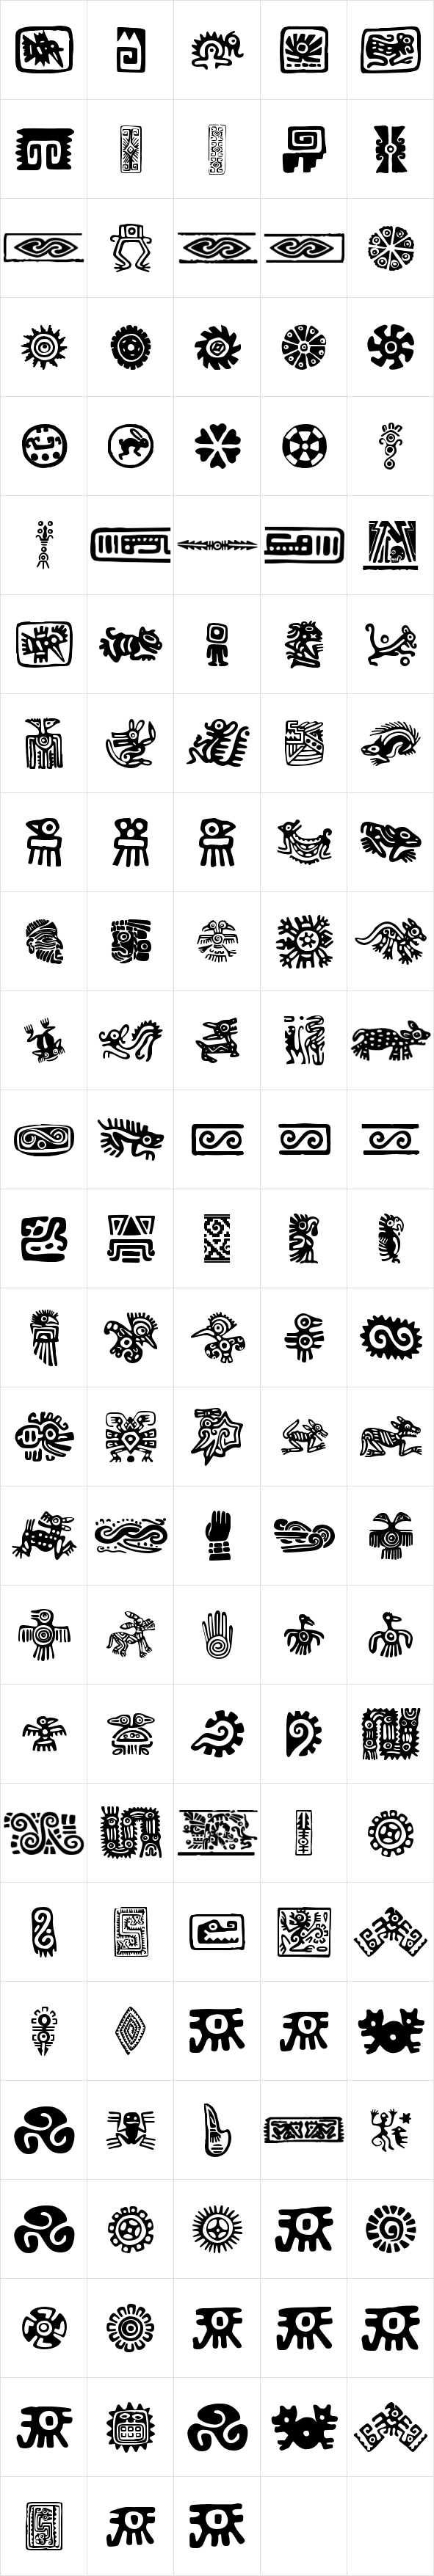 Color mind n 186 2 color mind 233 a nova revista de colorir anti stress - P22 Mexican Relics By Ihof Desktop Font Youworkforthem Fonts Stencils Pinterest Fuentes Y Mexicanos